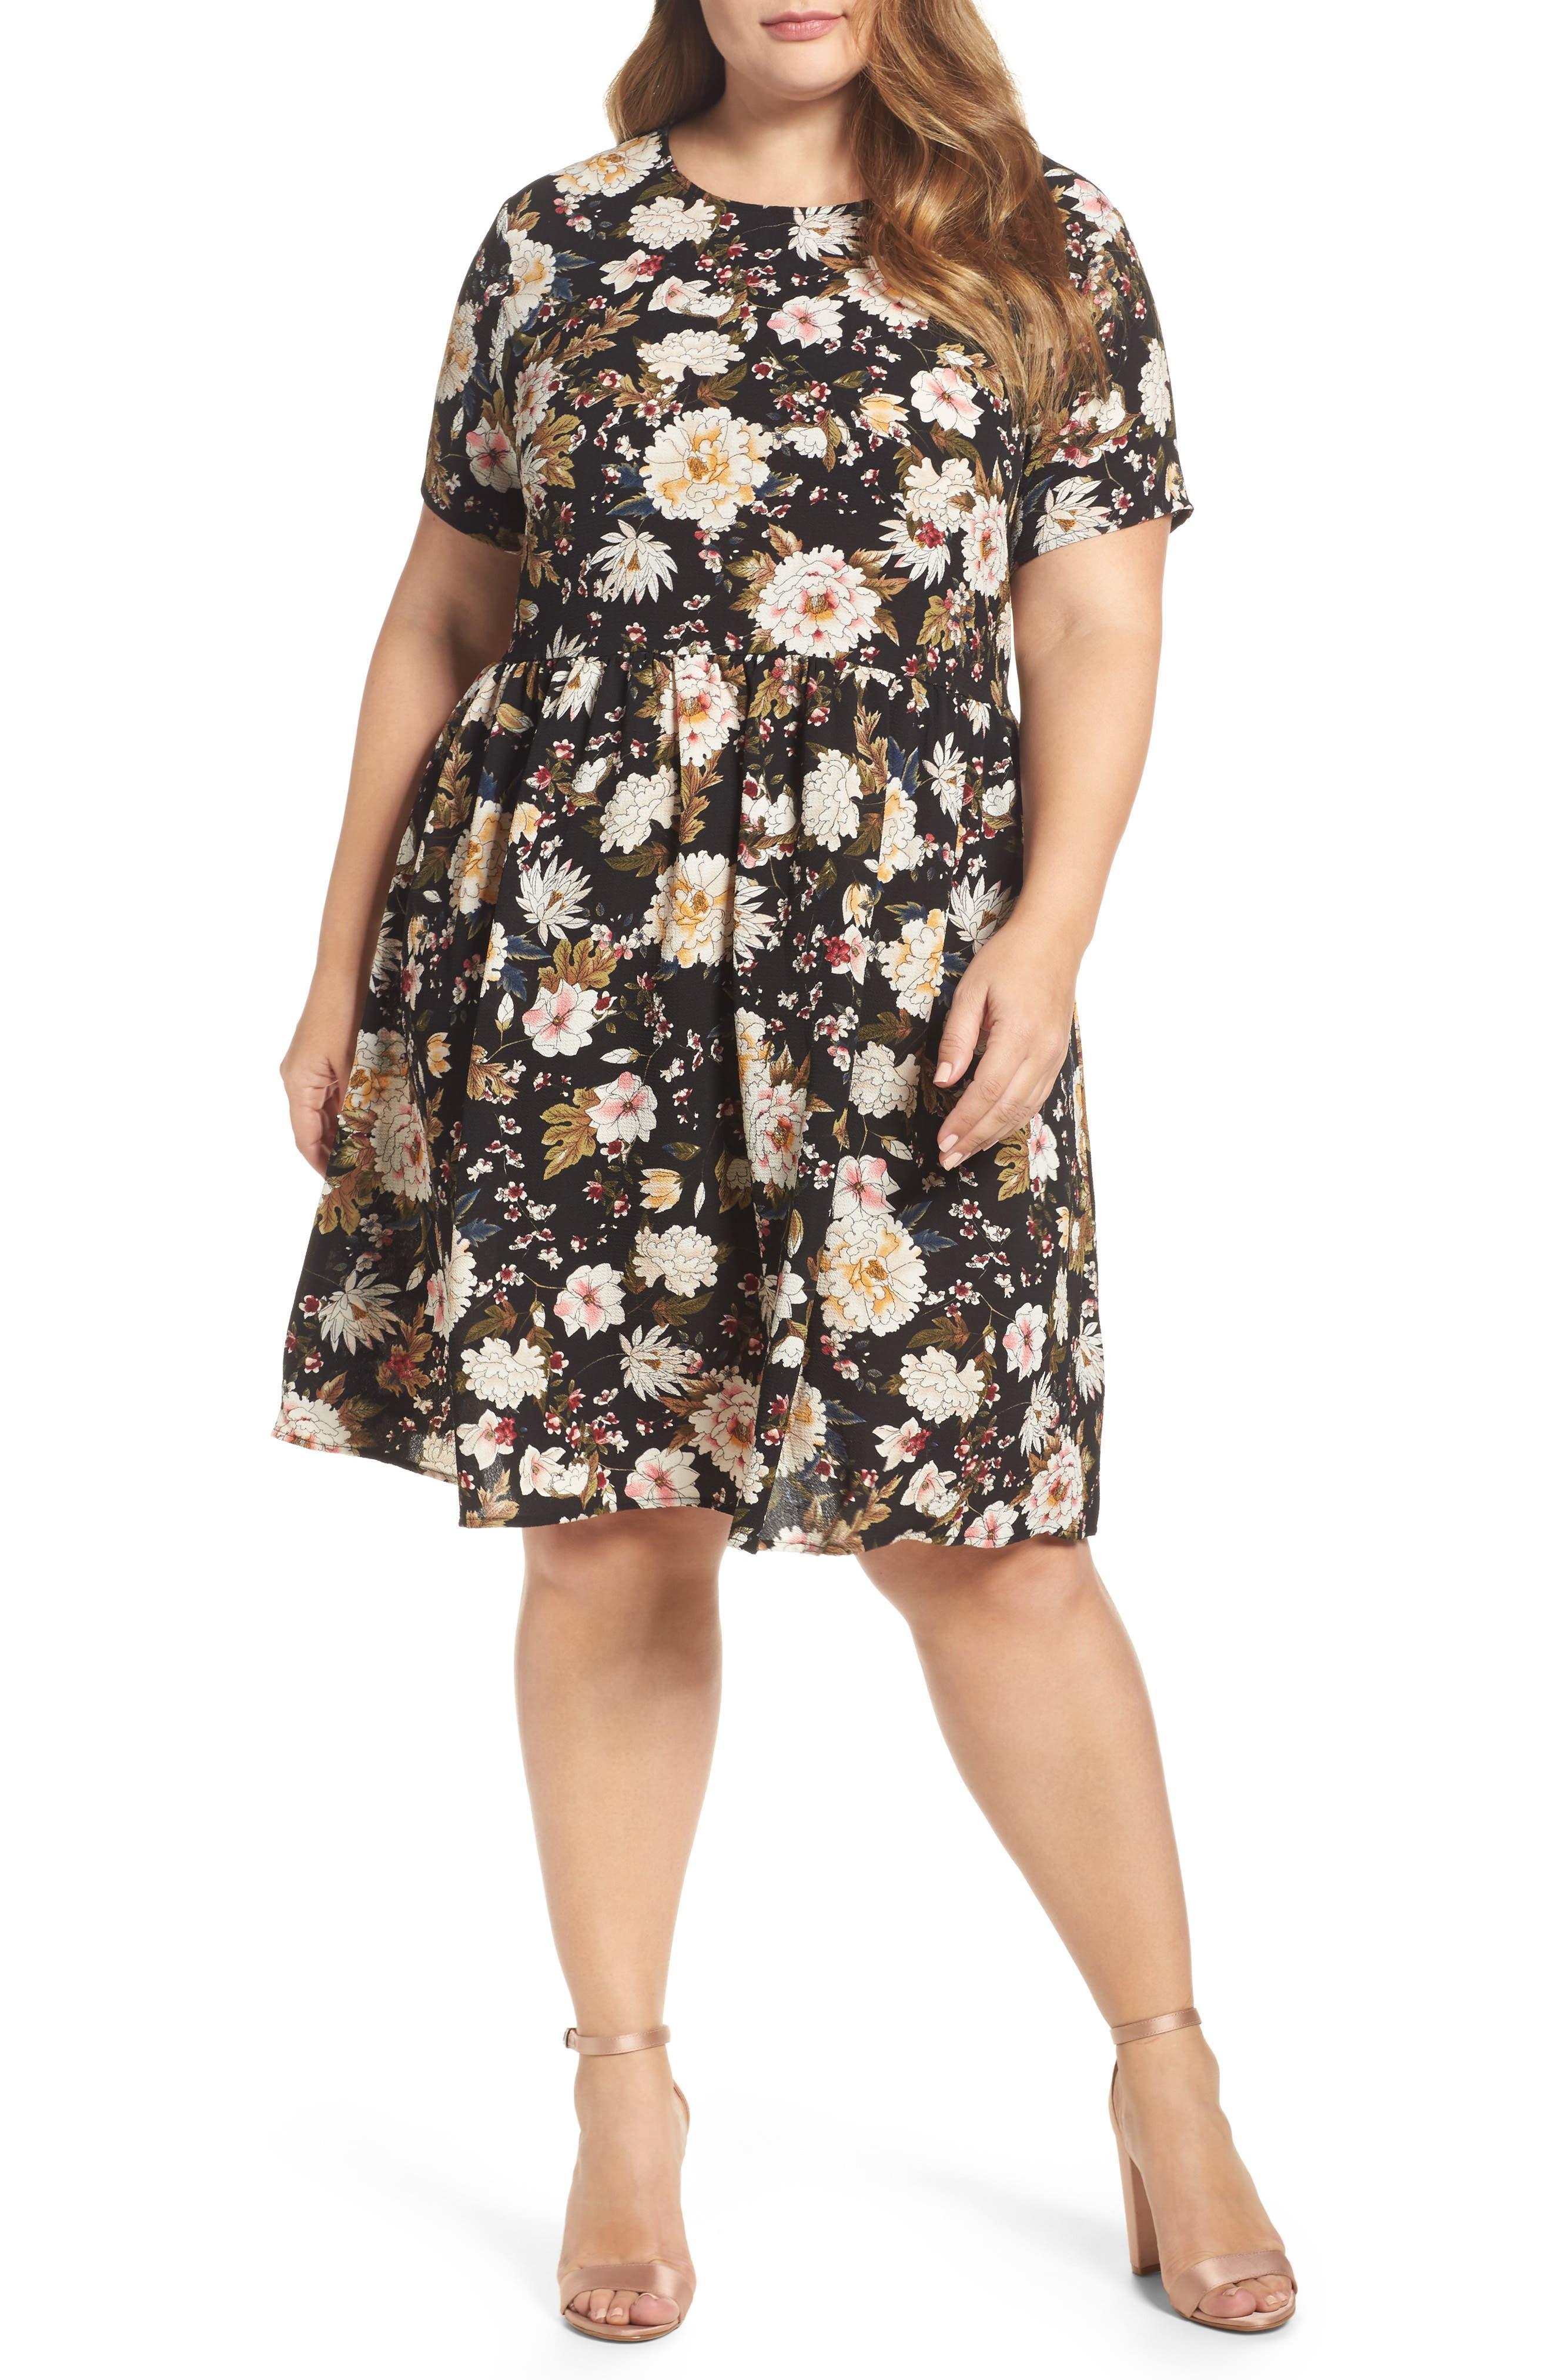 Main Image - Glamorous Empire Waist Floral Print Dress (Plus Size)